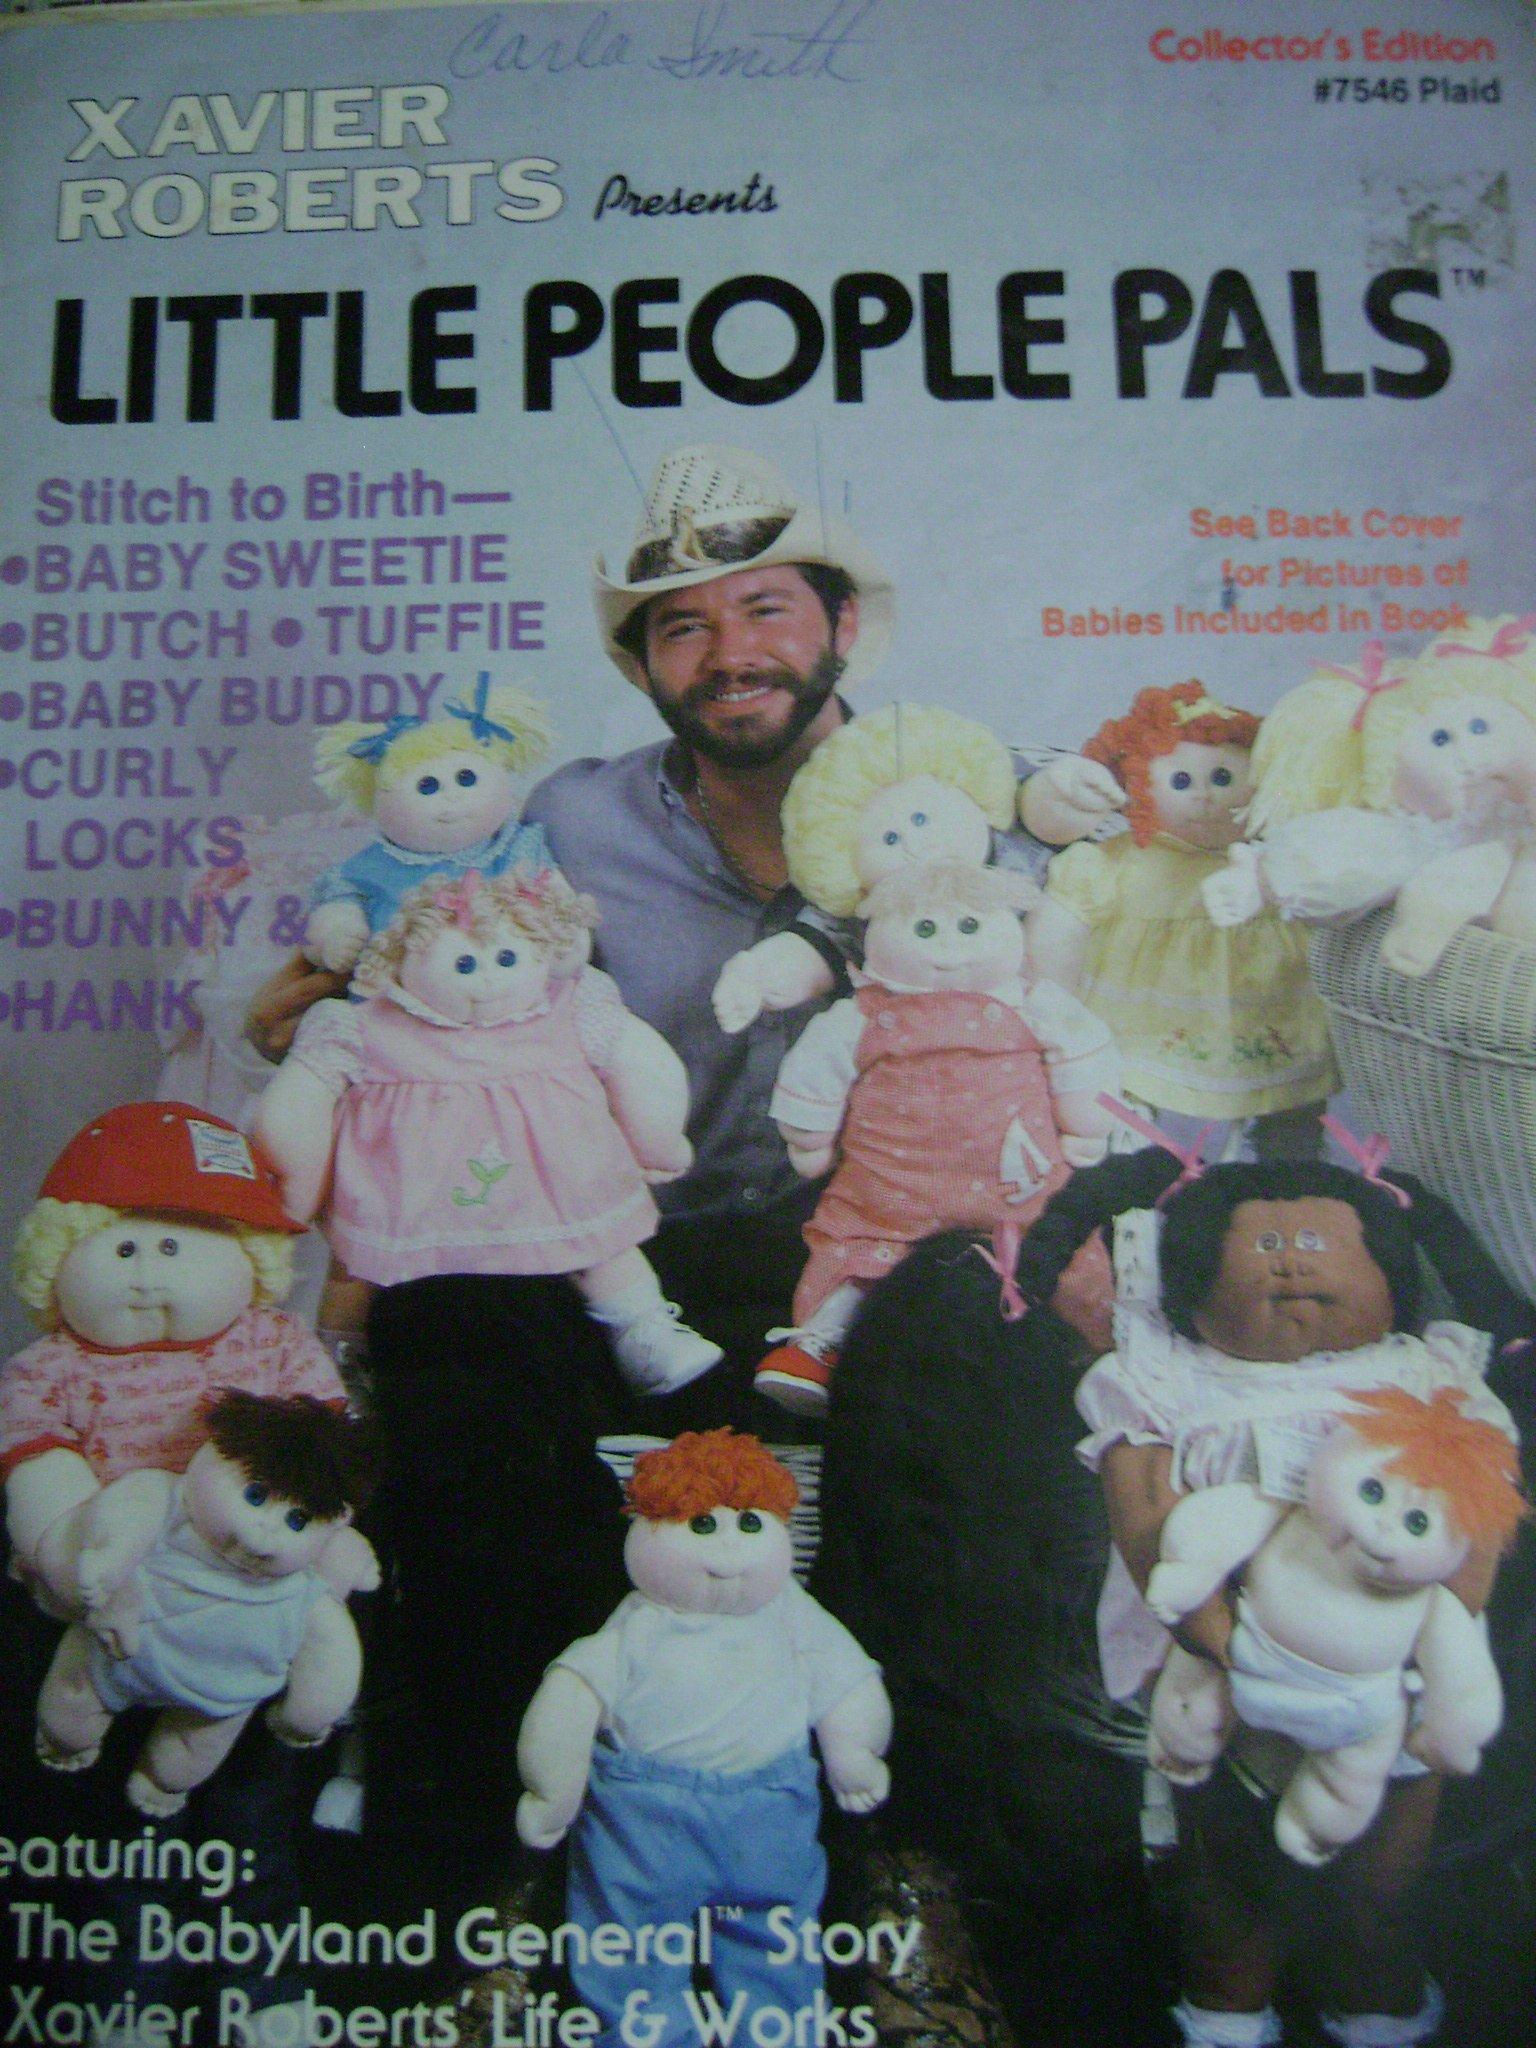 Xavier Roberts presents little people pals